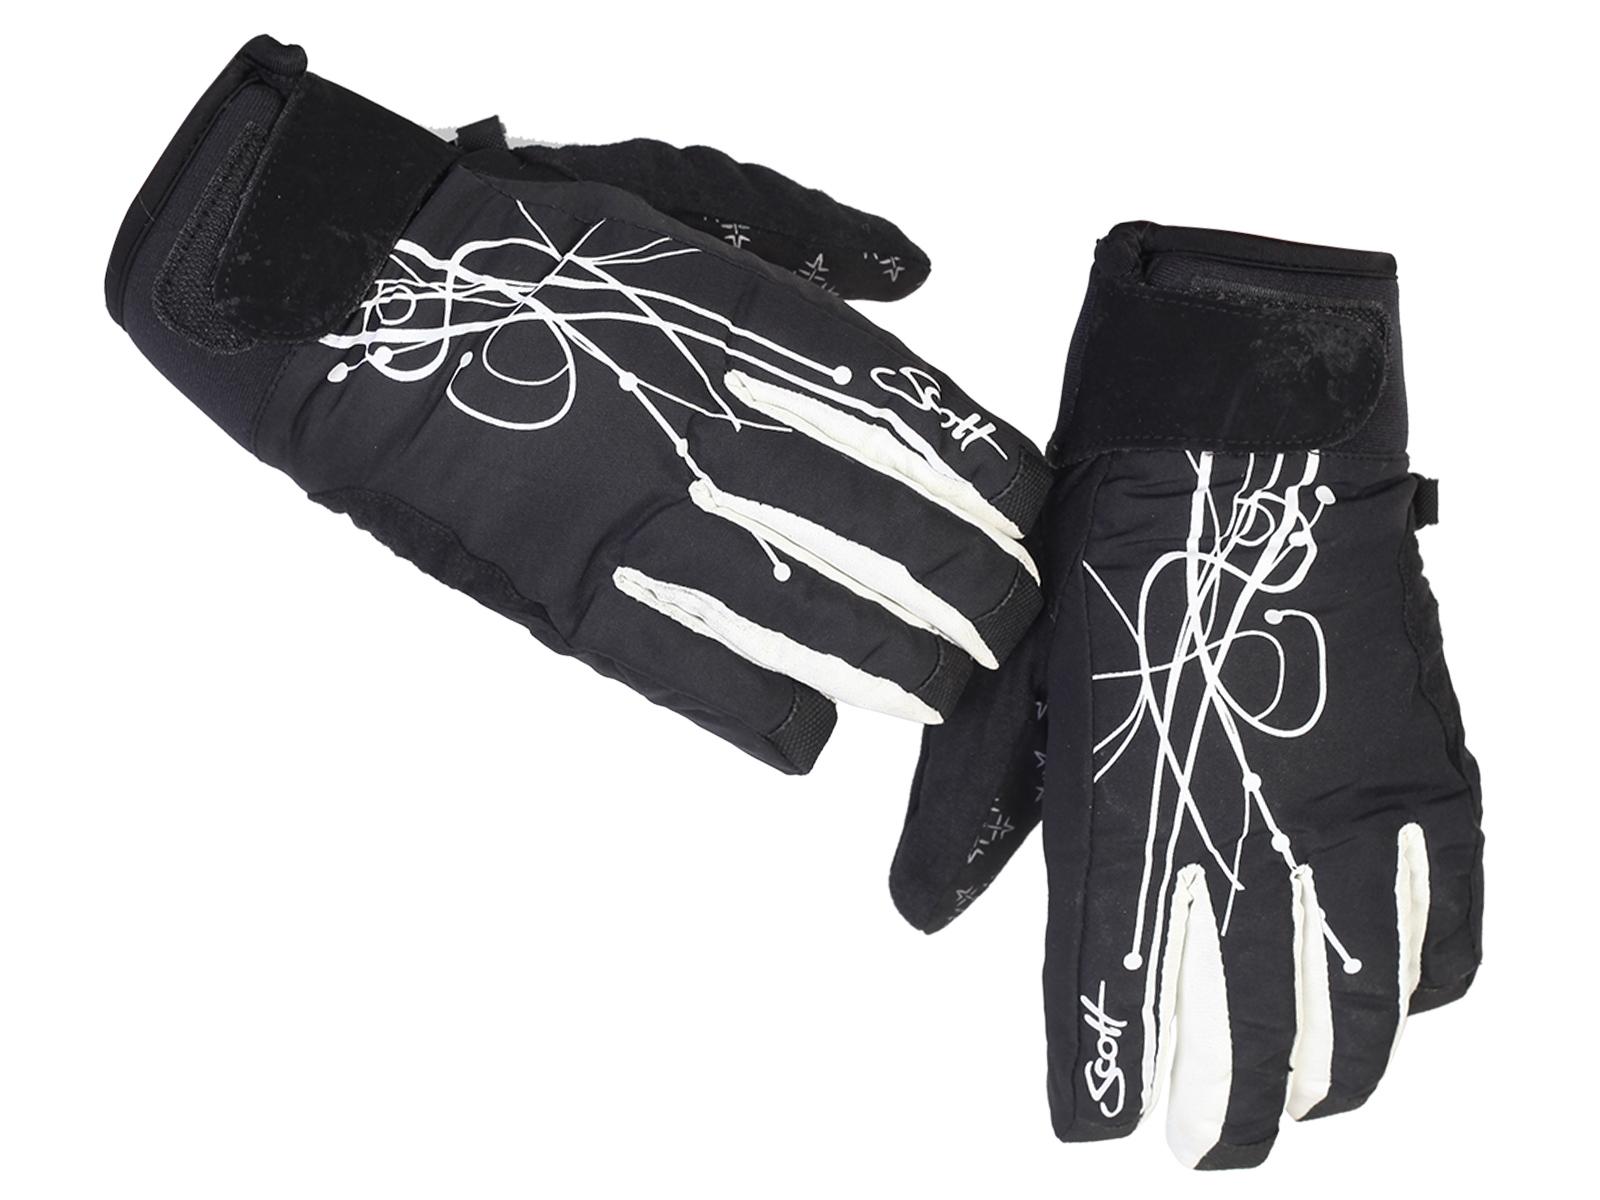 Теплые перчатки с короткими манжетами на липучке